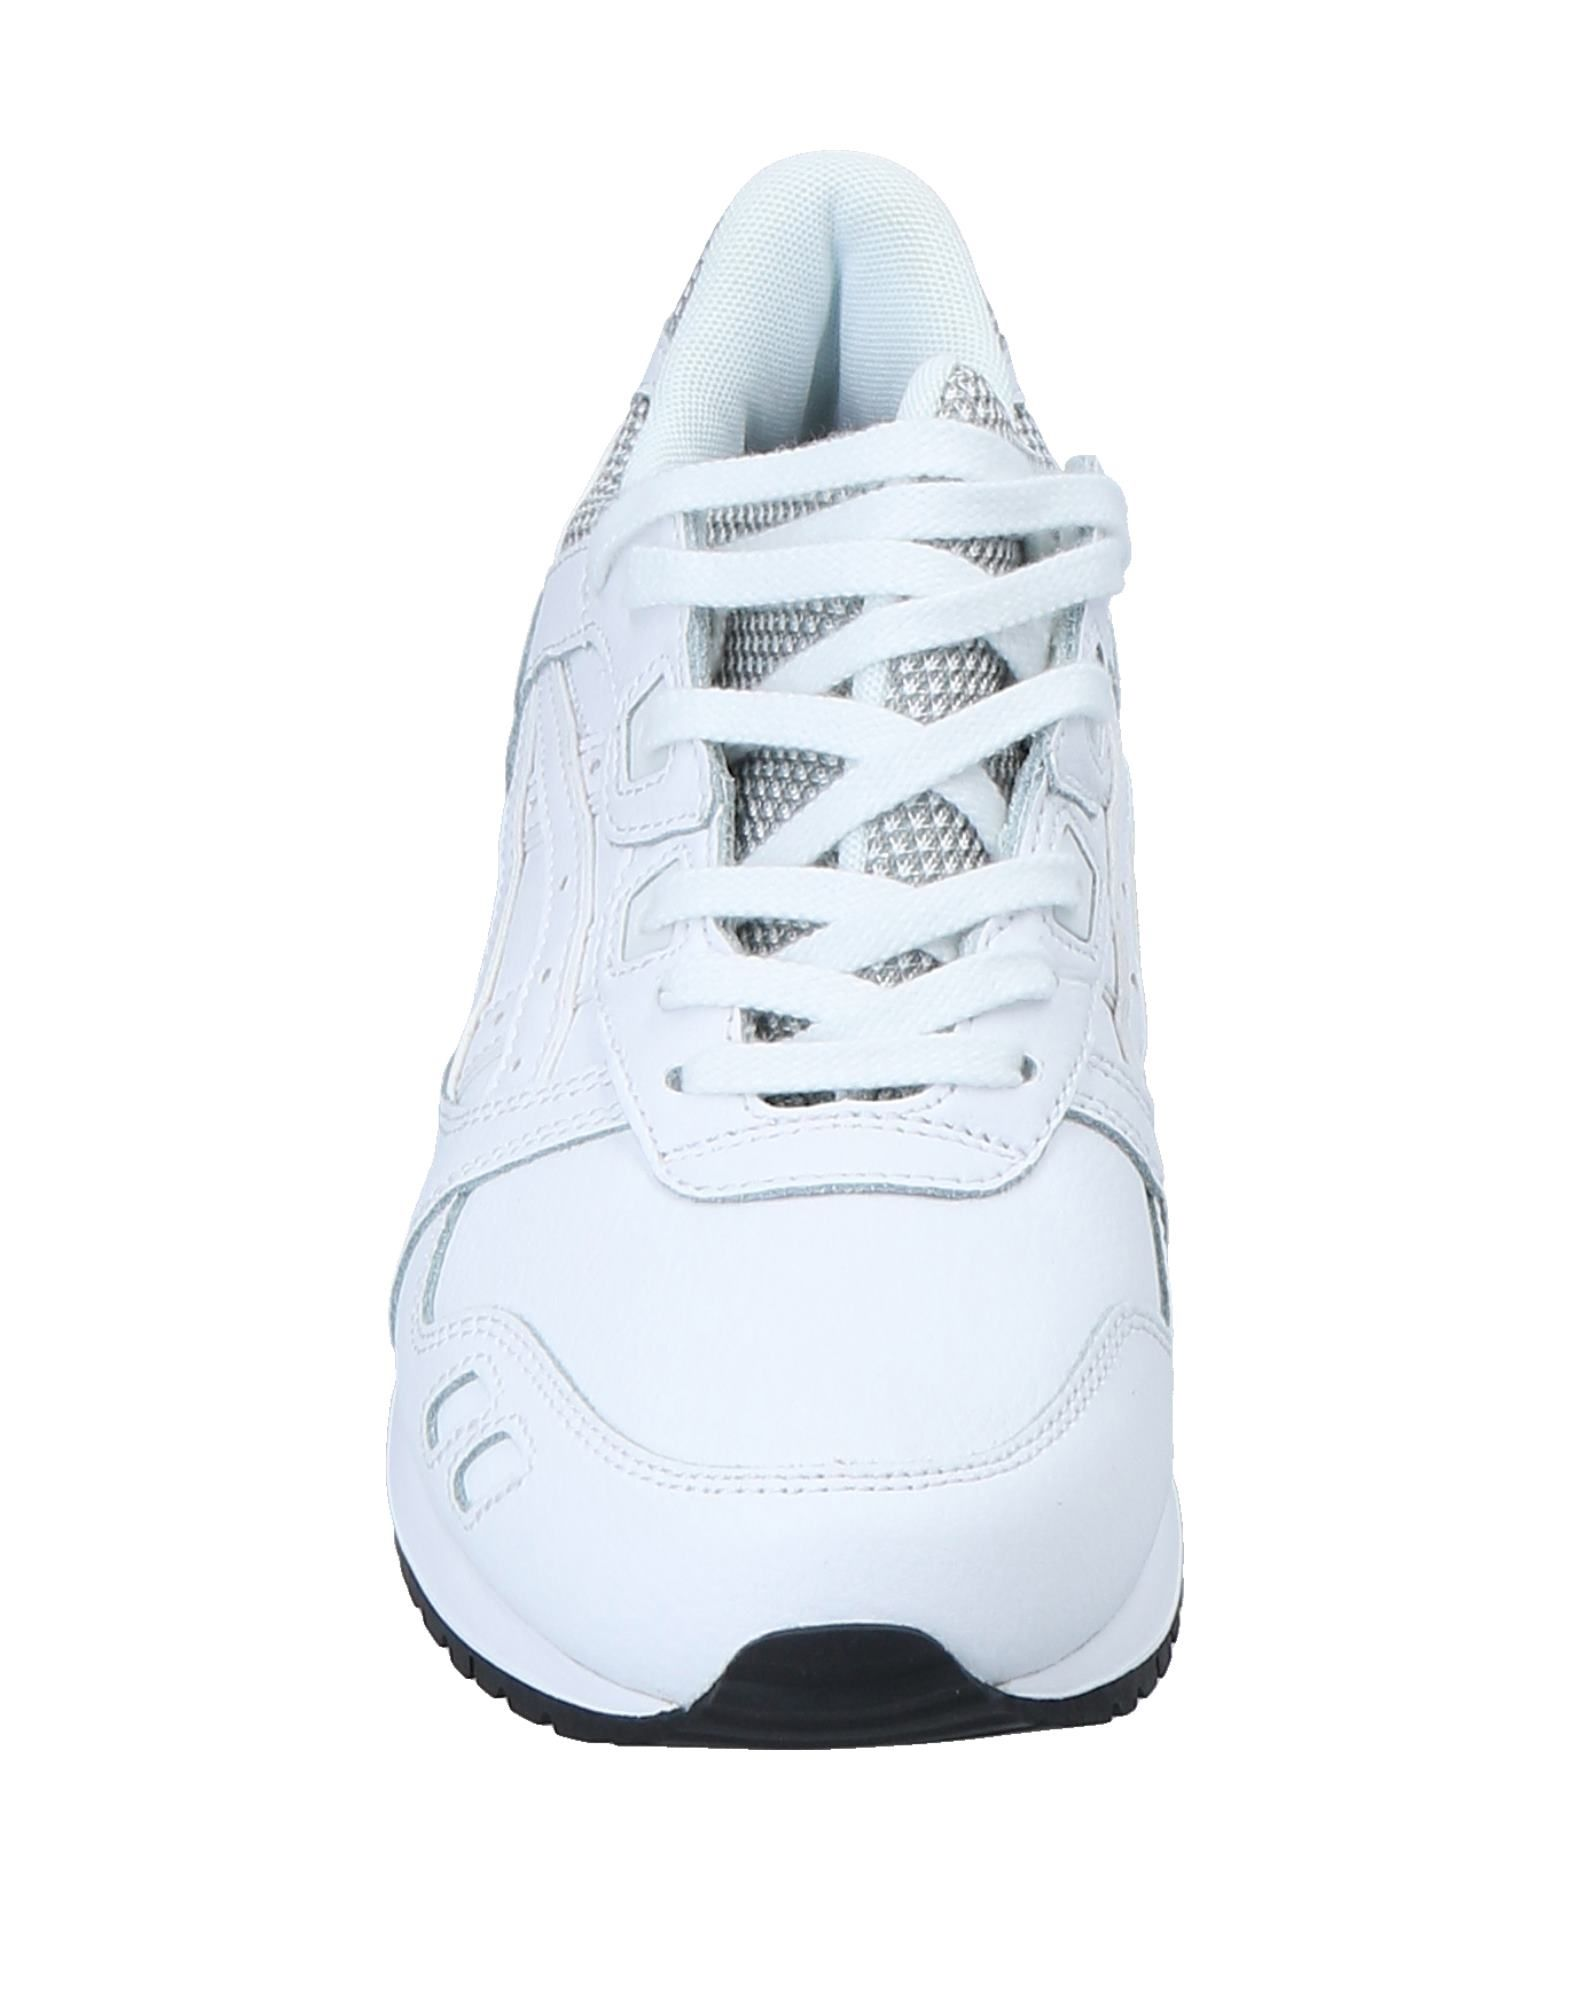 Asics es Sneakers Herren Gutes Preis-Leistungs-Verhältnis, es Asics lohnt sich 7fe21b